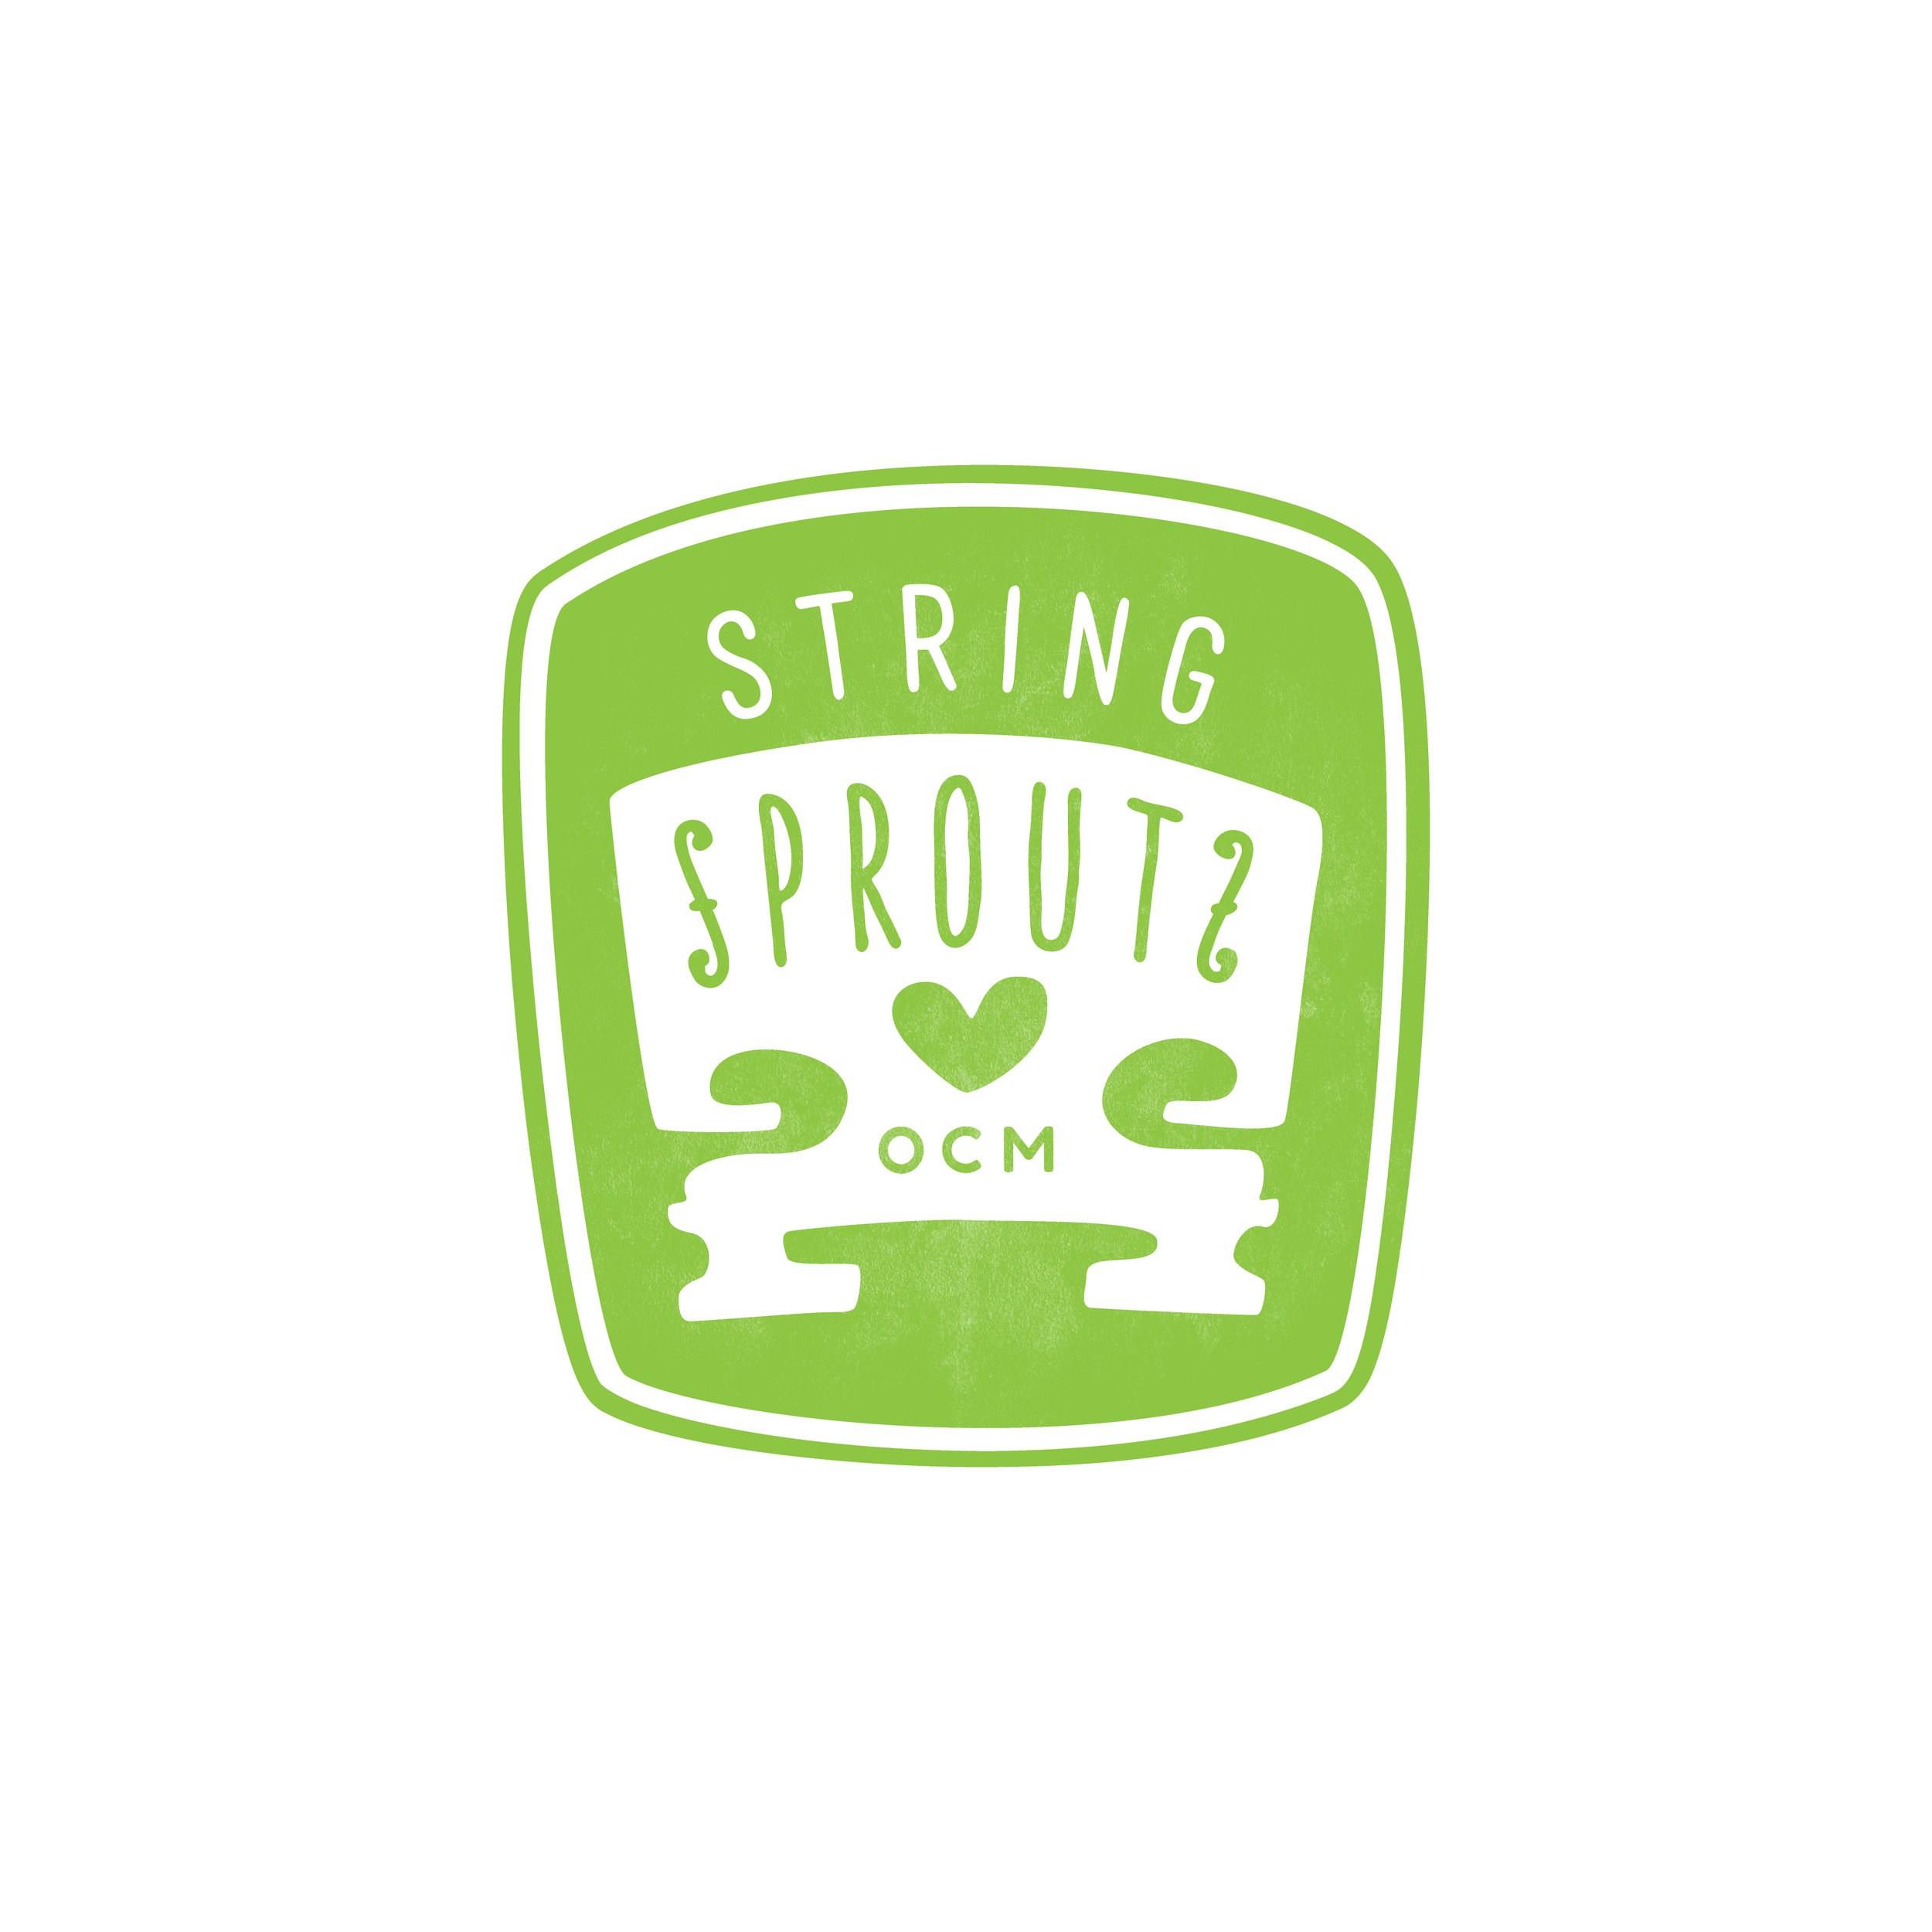 String-Sprouts-logo-emblem.jpg